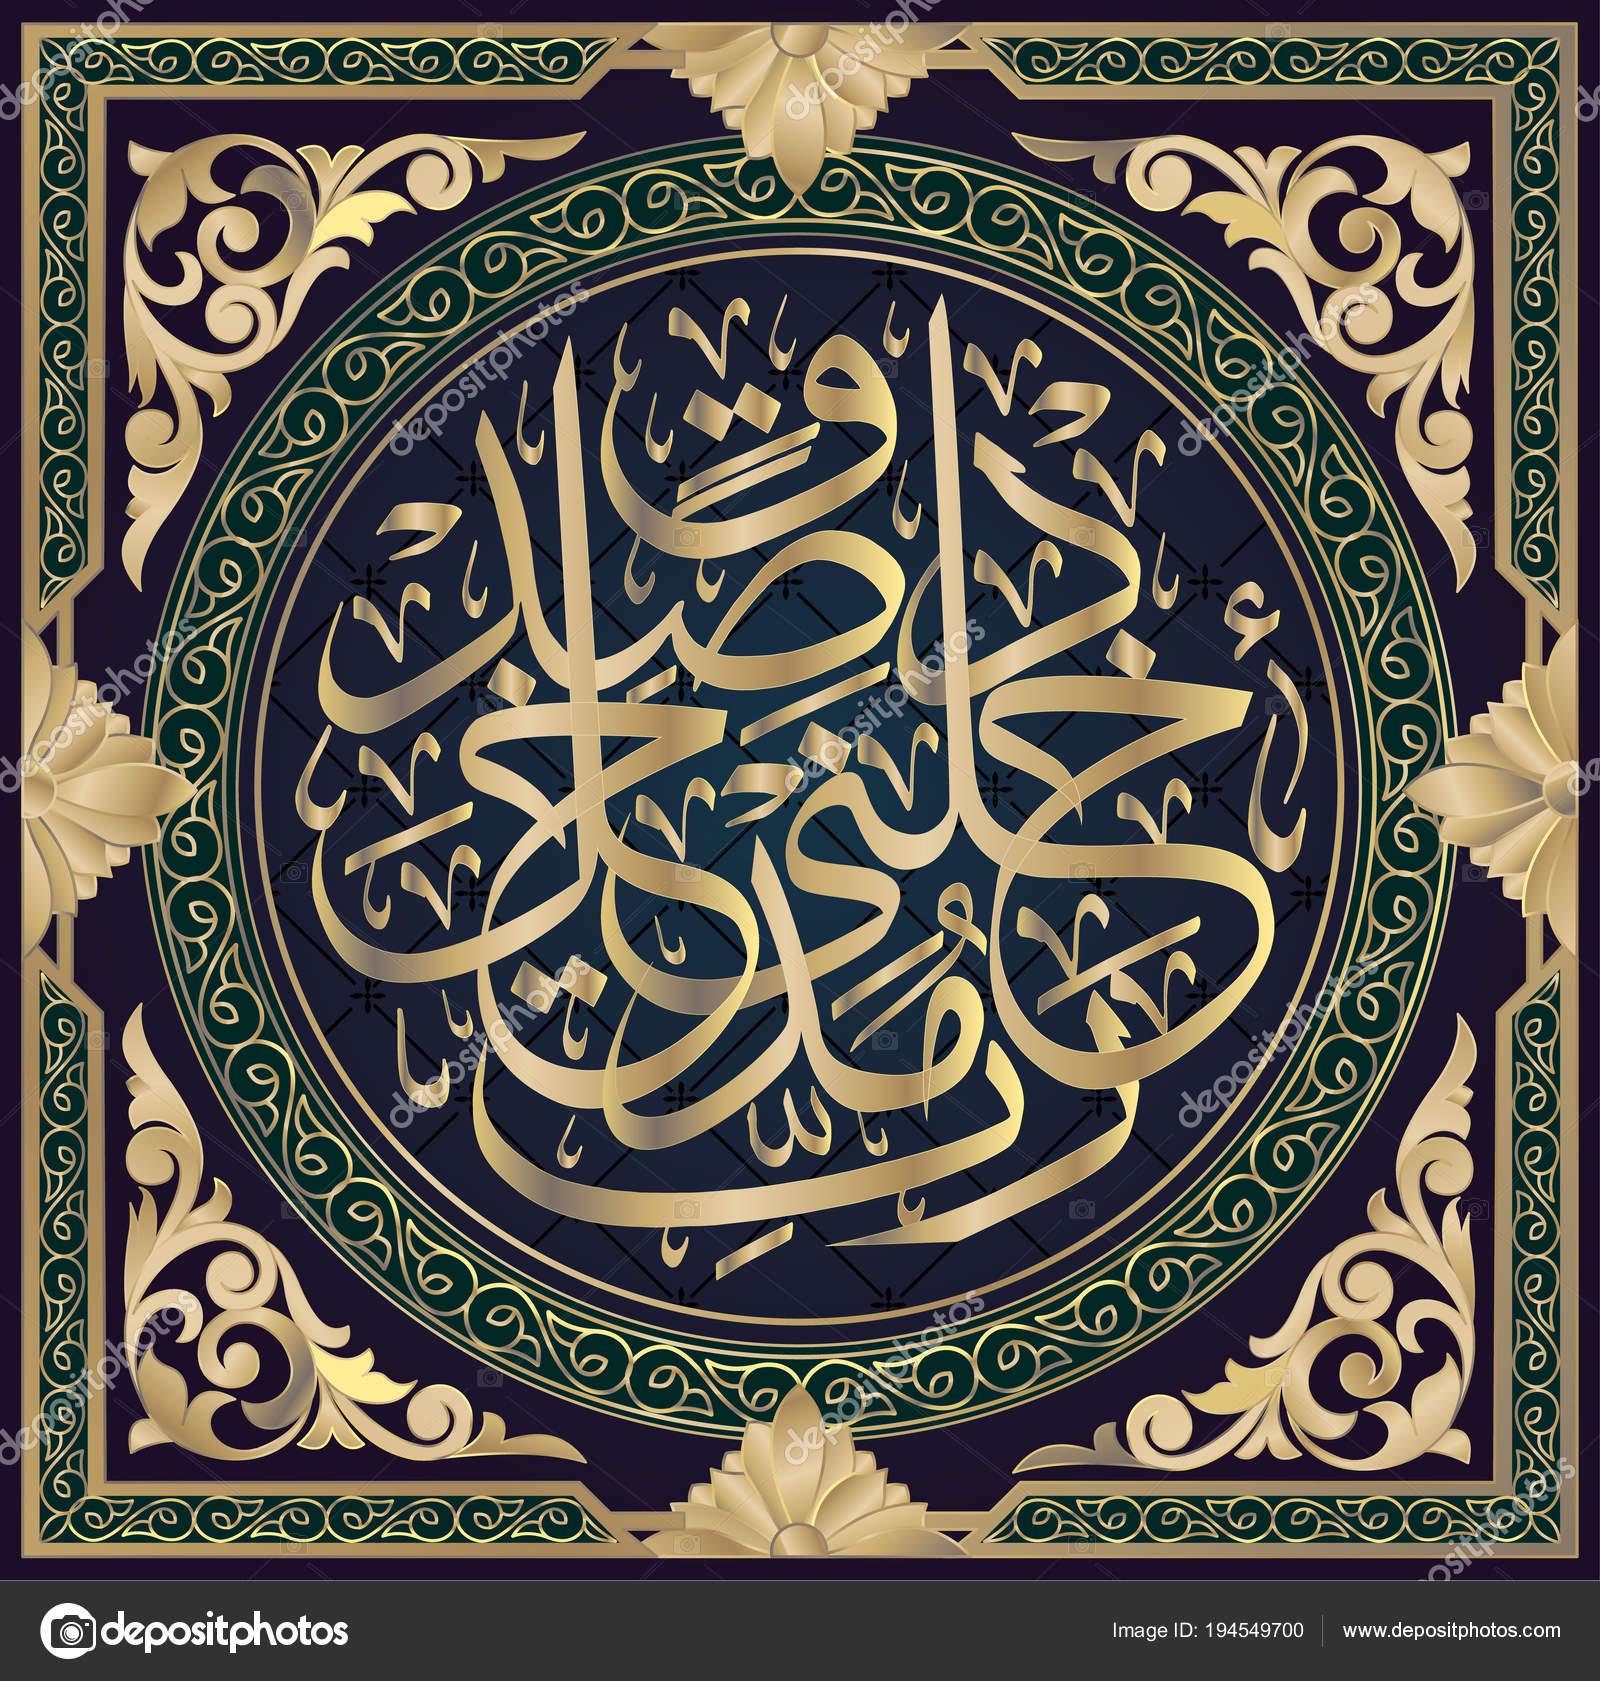 Image result for Surah al isra calligraphy